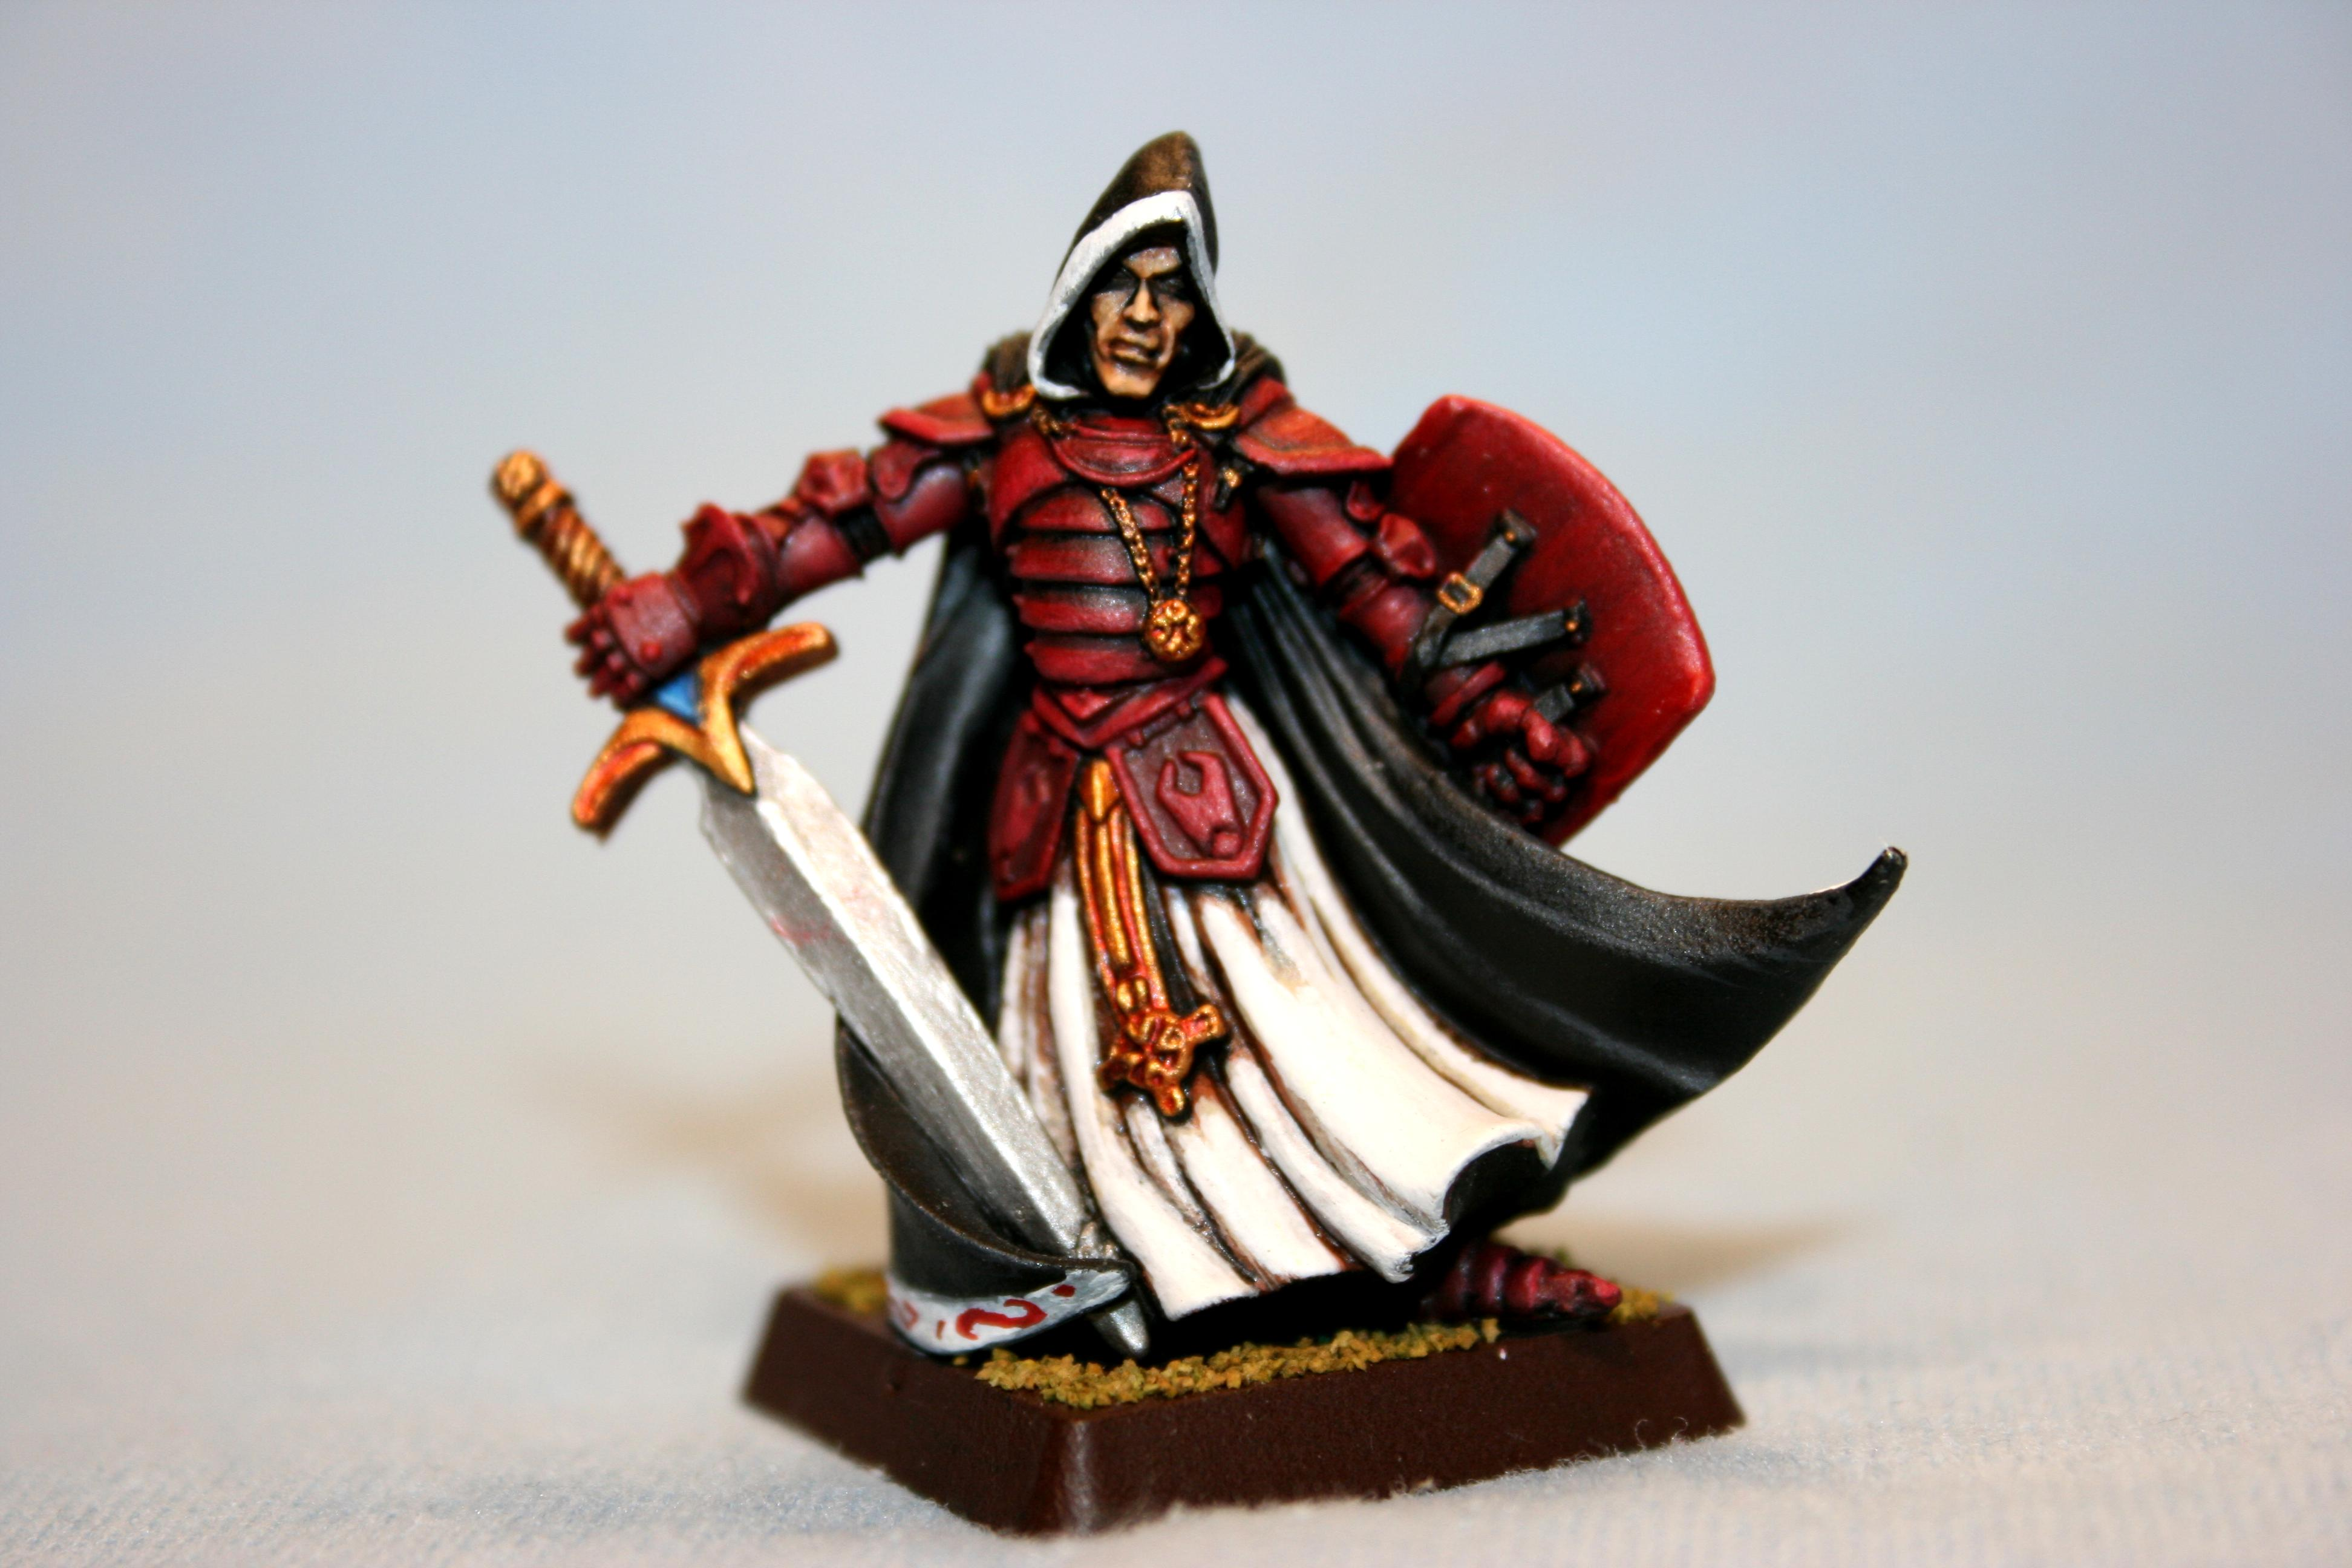 Greg the Templar